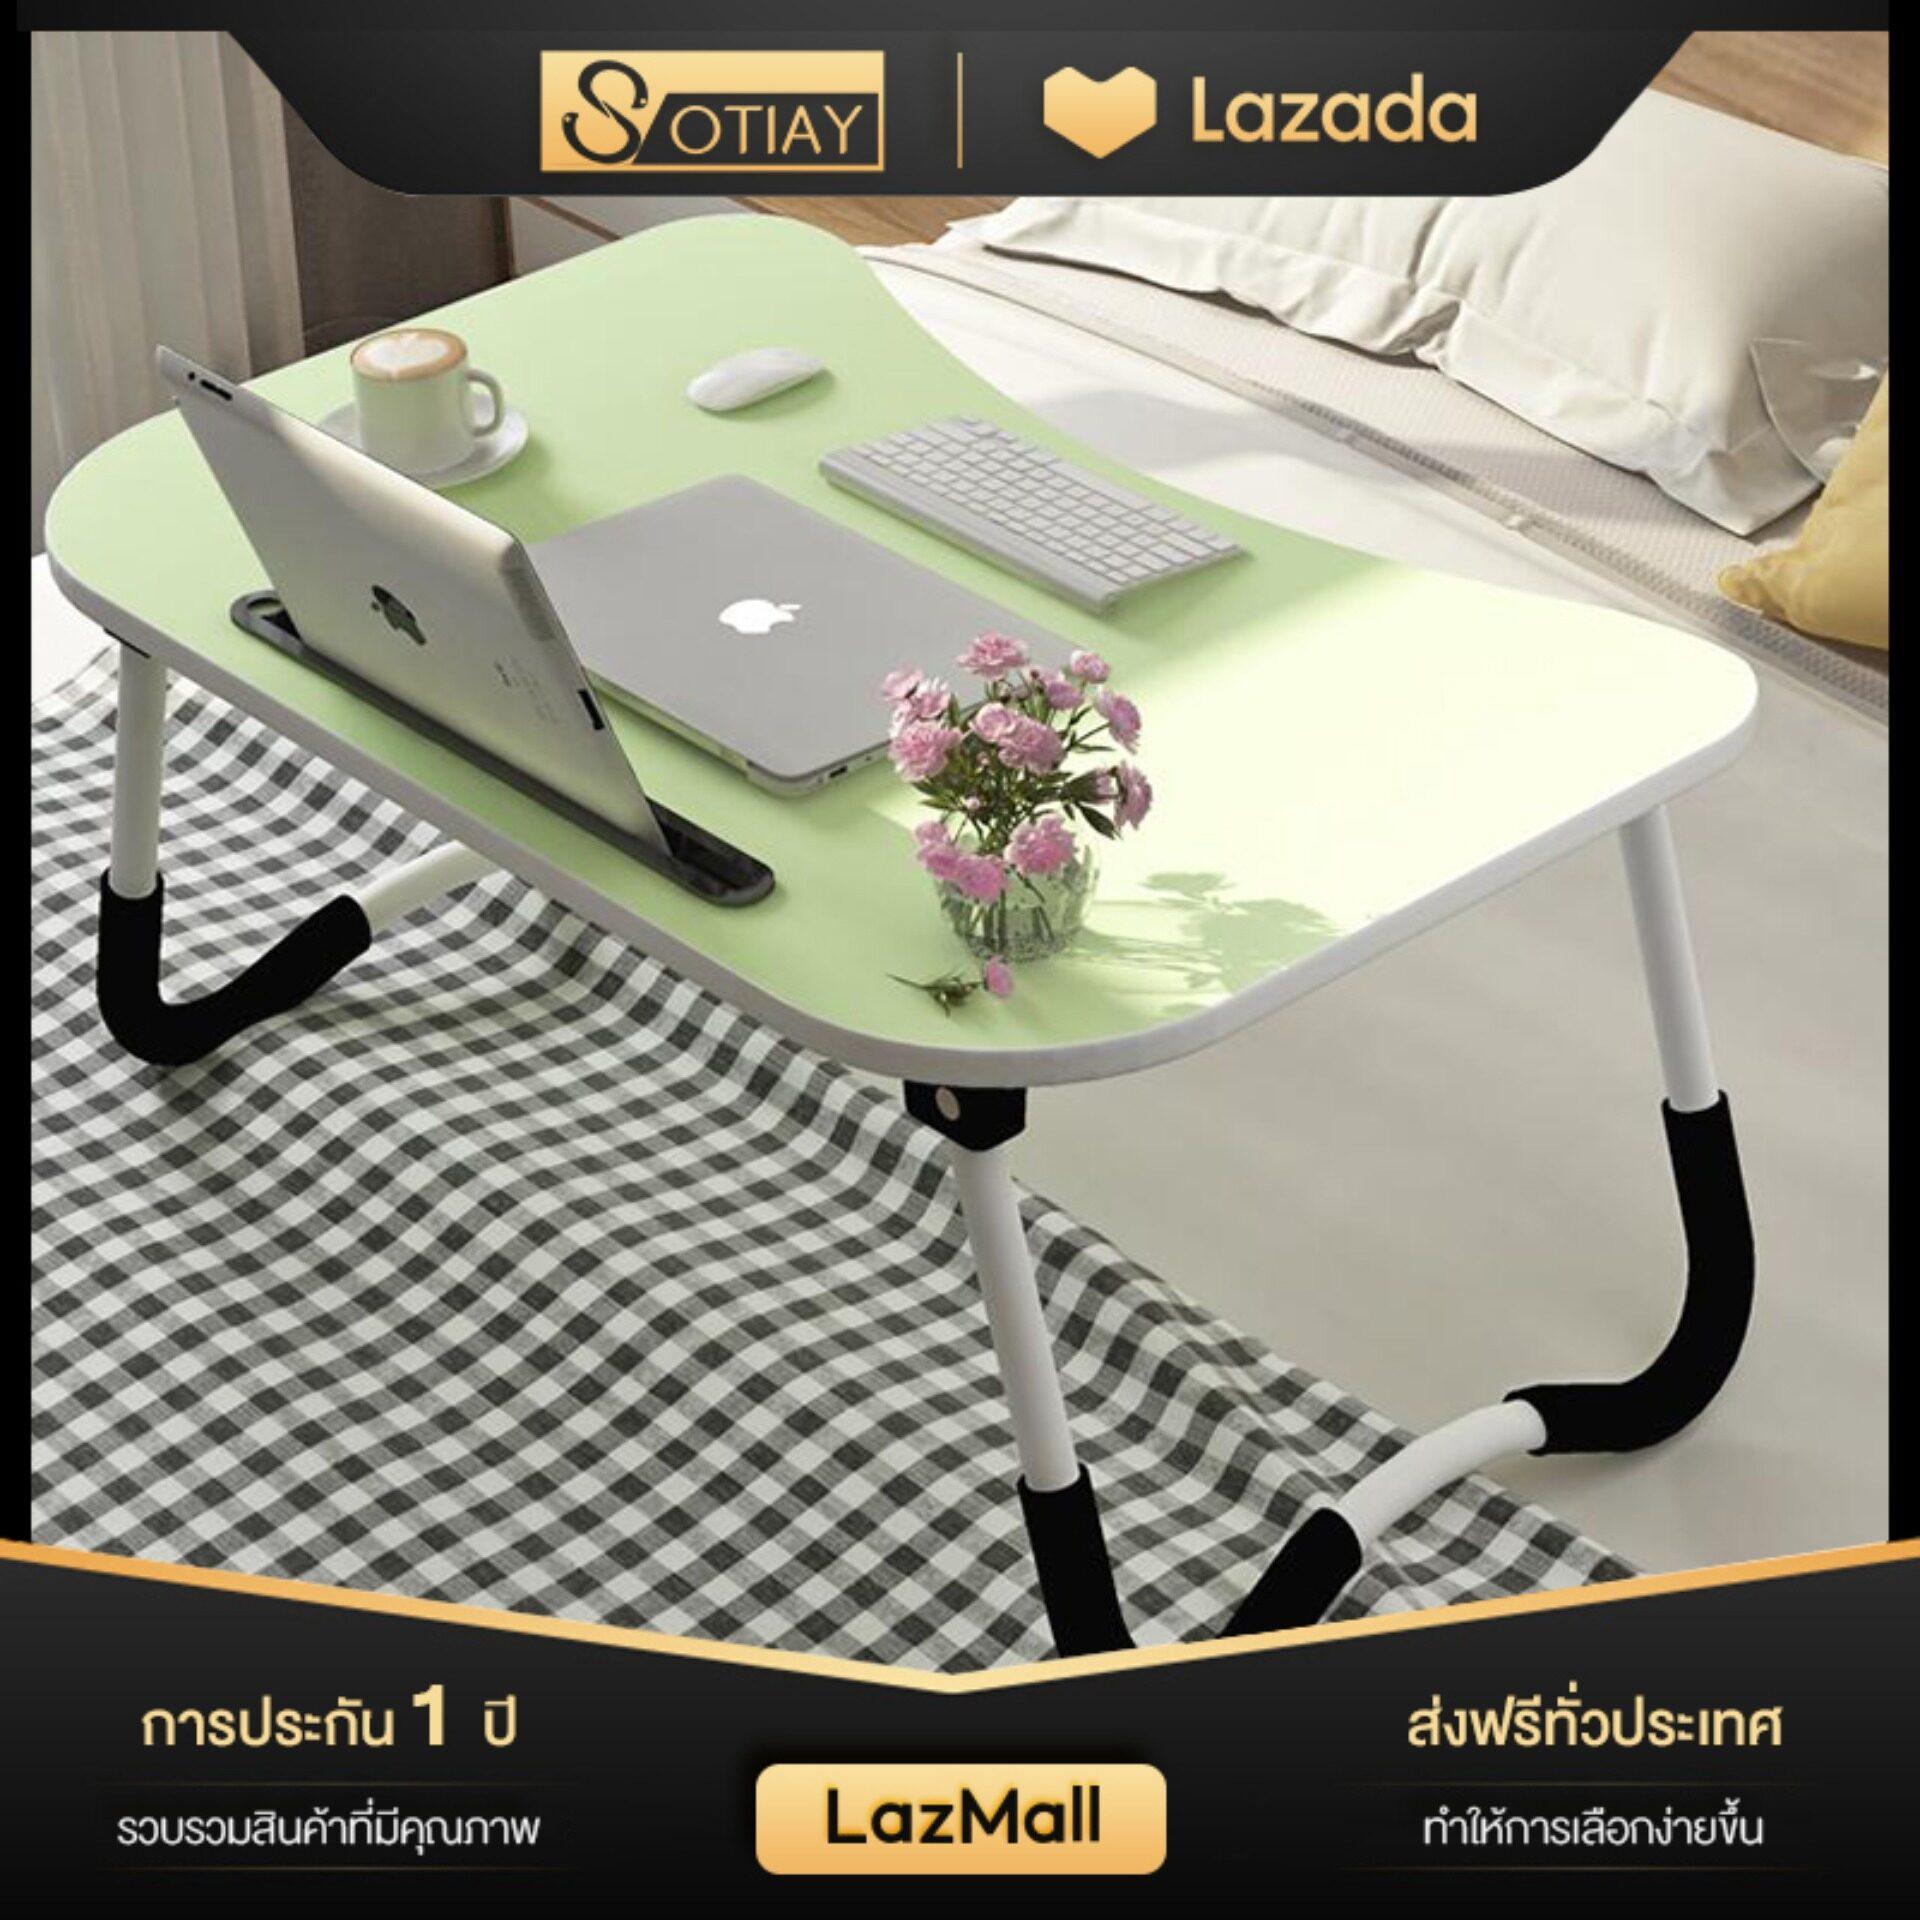 Sotiay โต๊ะญี่ปุ่น โต๊ะวางโน๊ตบุ๊ค โต๊ะอเนกประสงค์ โต๊ะทำงาน โต๊ะอ่านหนังสือ โต๊ะเขียนหนังสือ โต๊ะกาแฟ ที่วางipad/iphone โต๊ะข้างเตียง แท่นวางโน๊ตบุ๊ค.